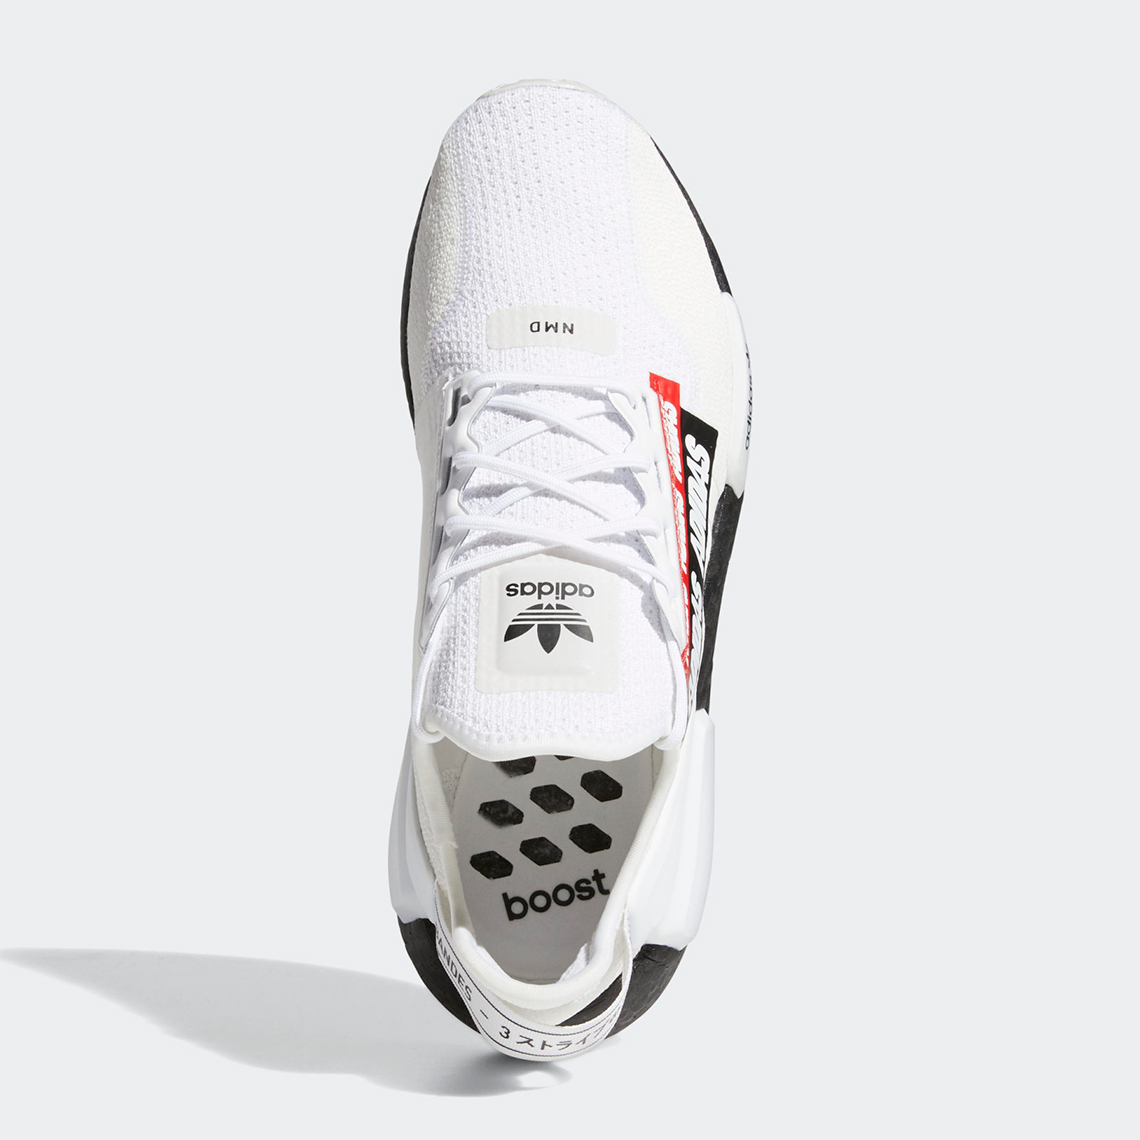 Adidas NMD R1 V2 Overbranded H02537 | SneakerNews.com